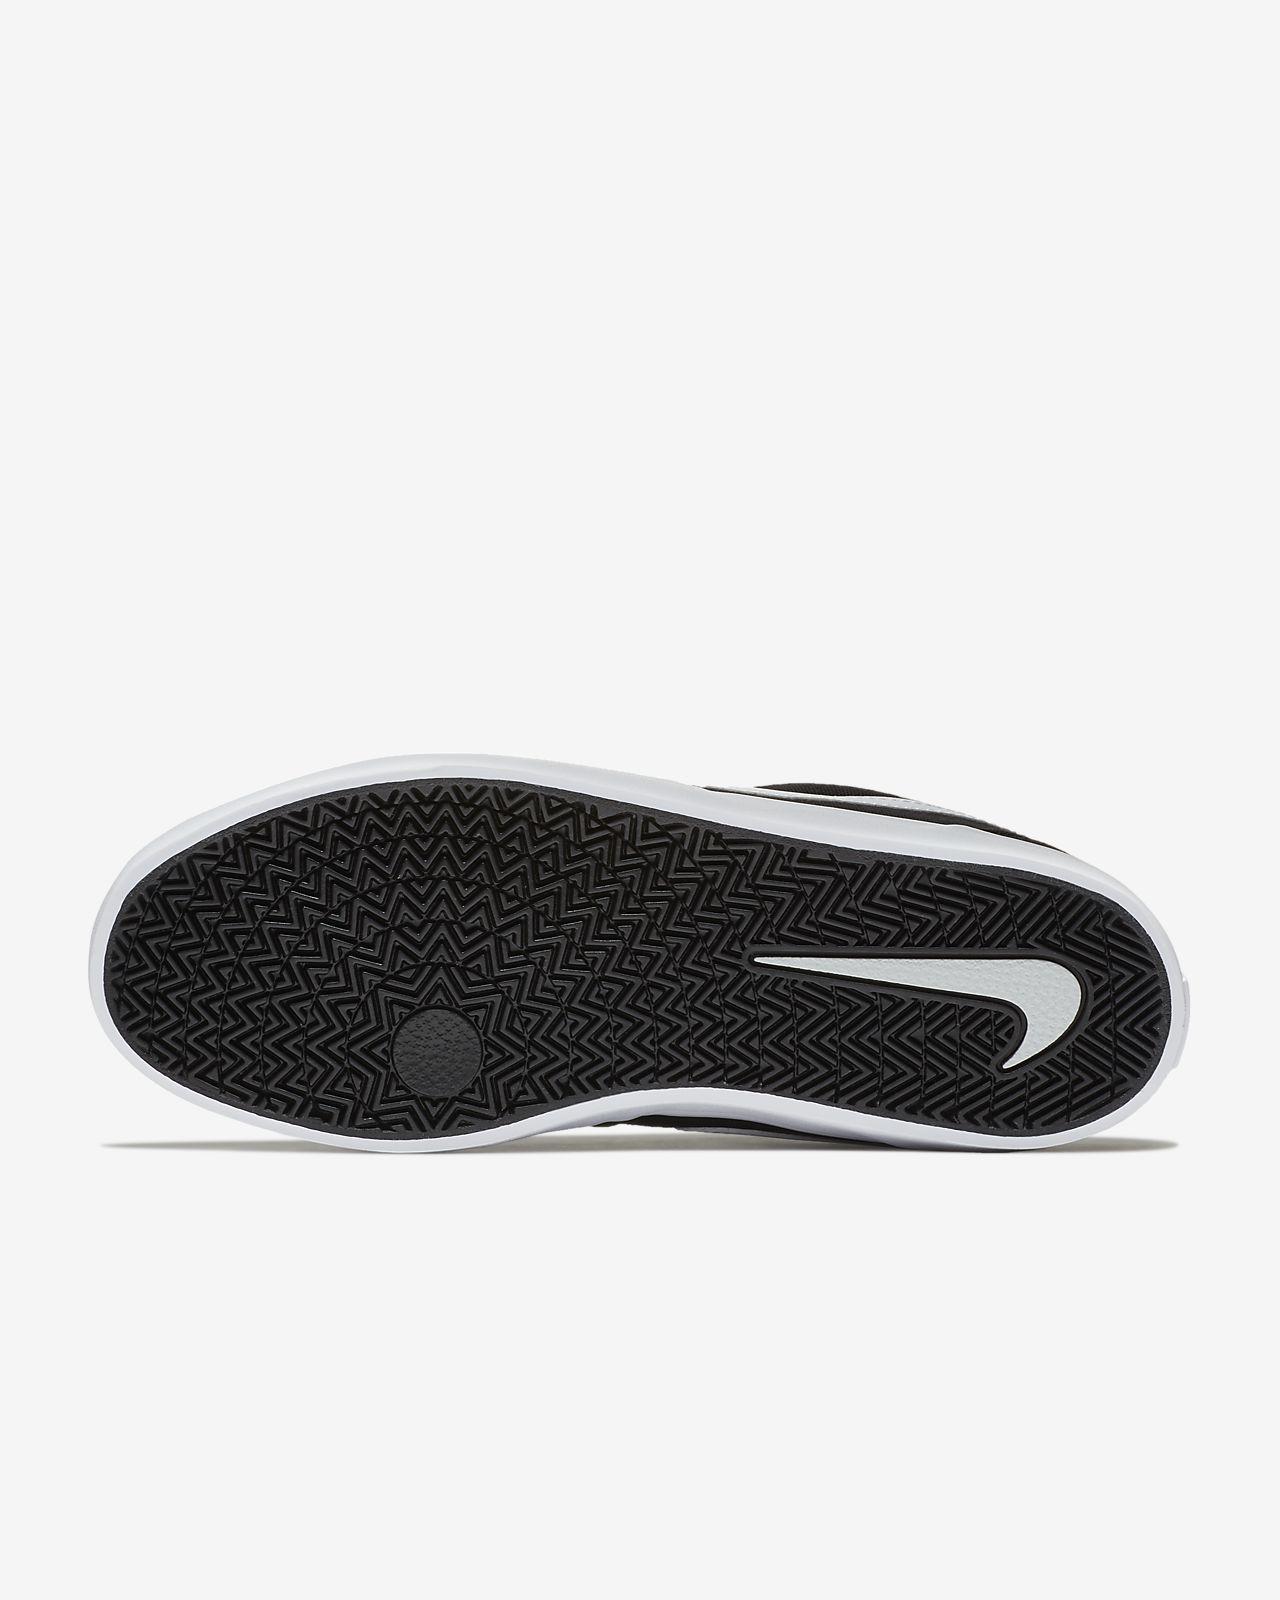 49dc281ee6d6e4 Nike SB Check Solarsoft Canvas Women s Skateboarding Shoe. Nike.com